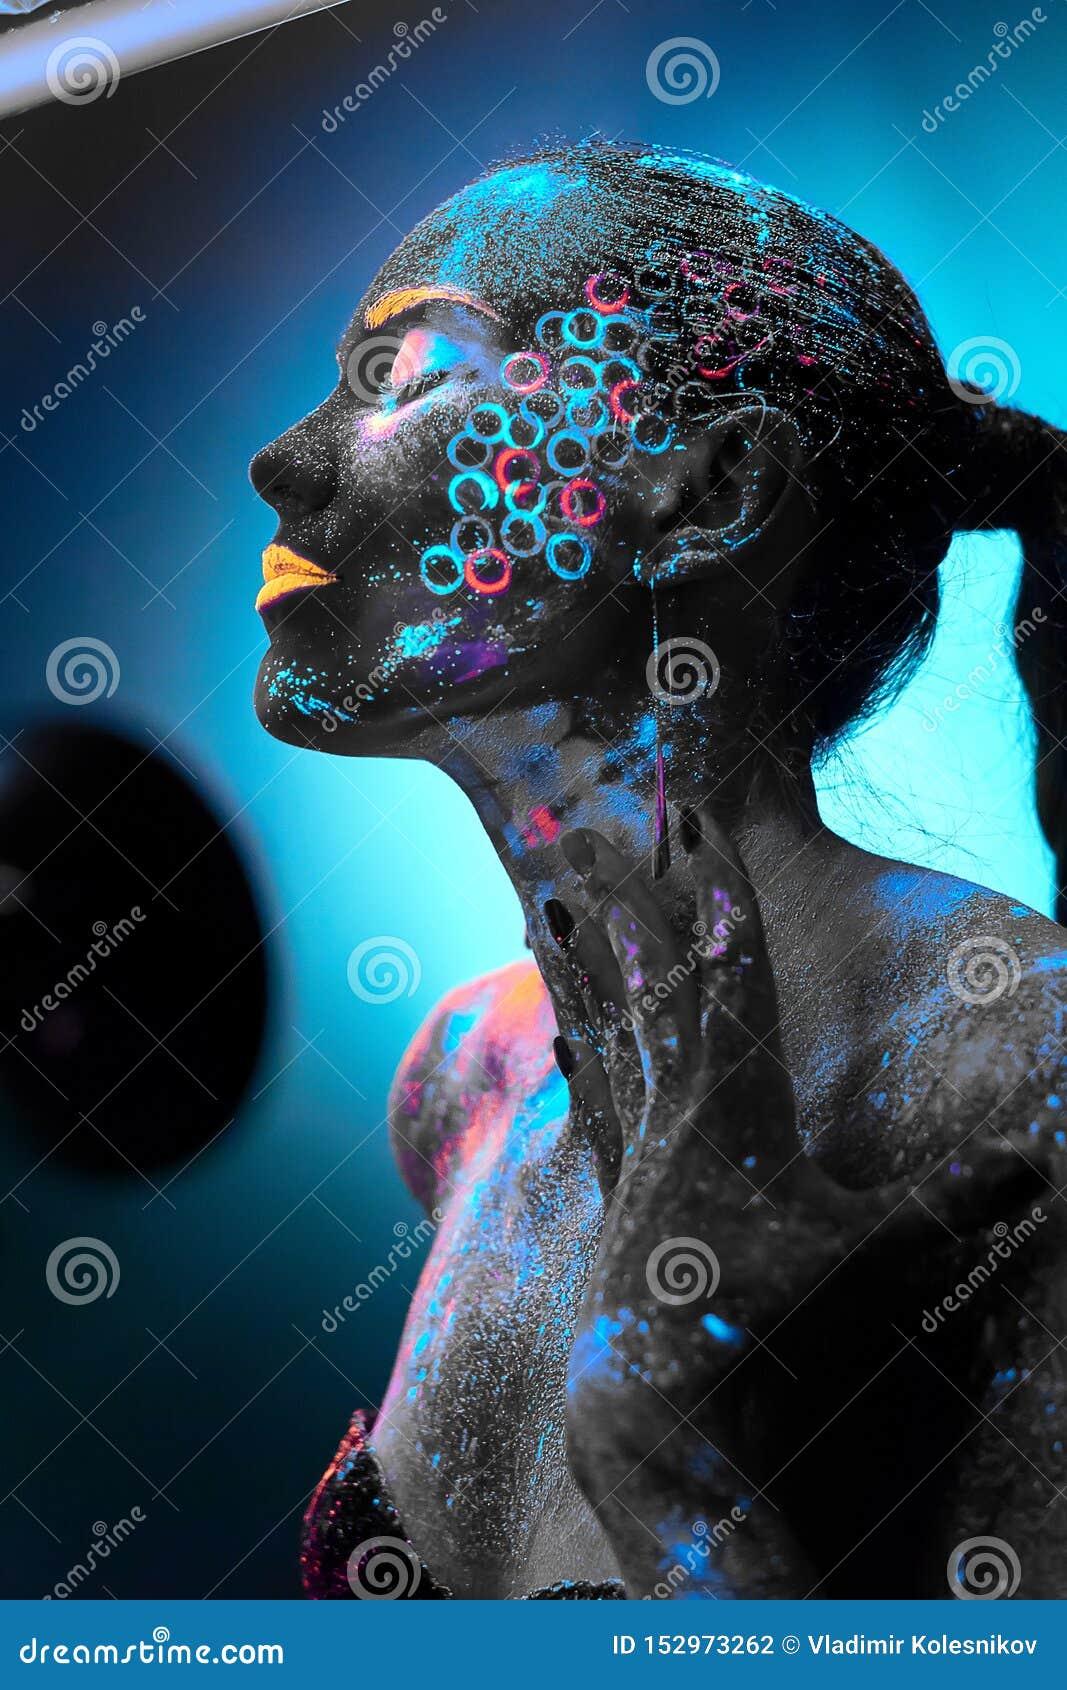 Girl in neon body art